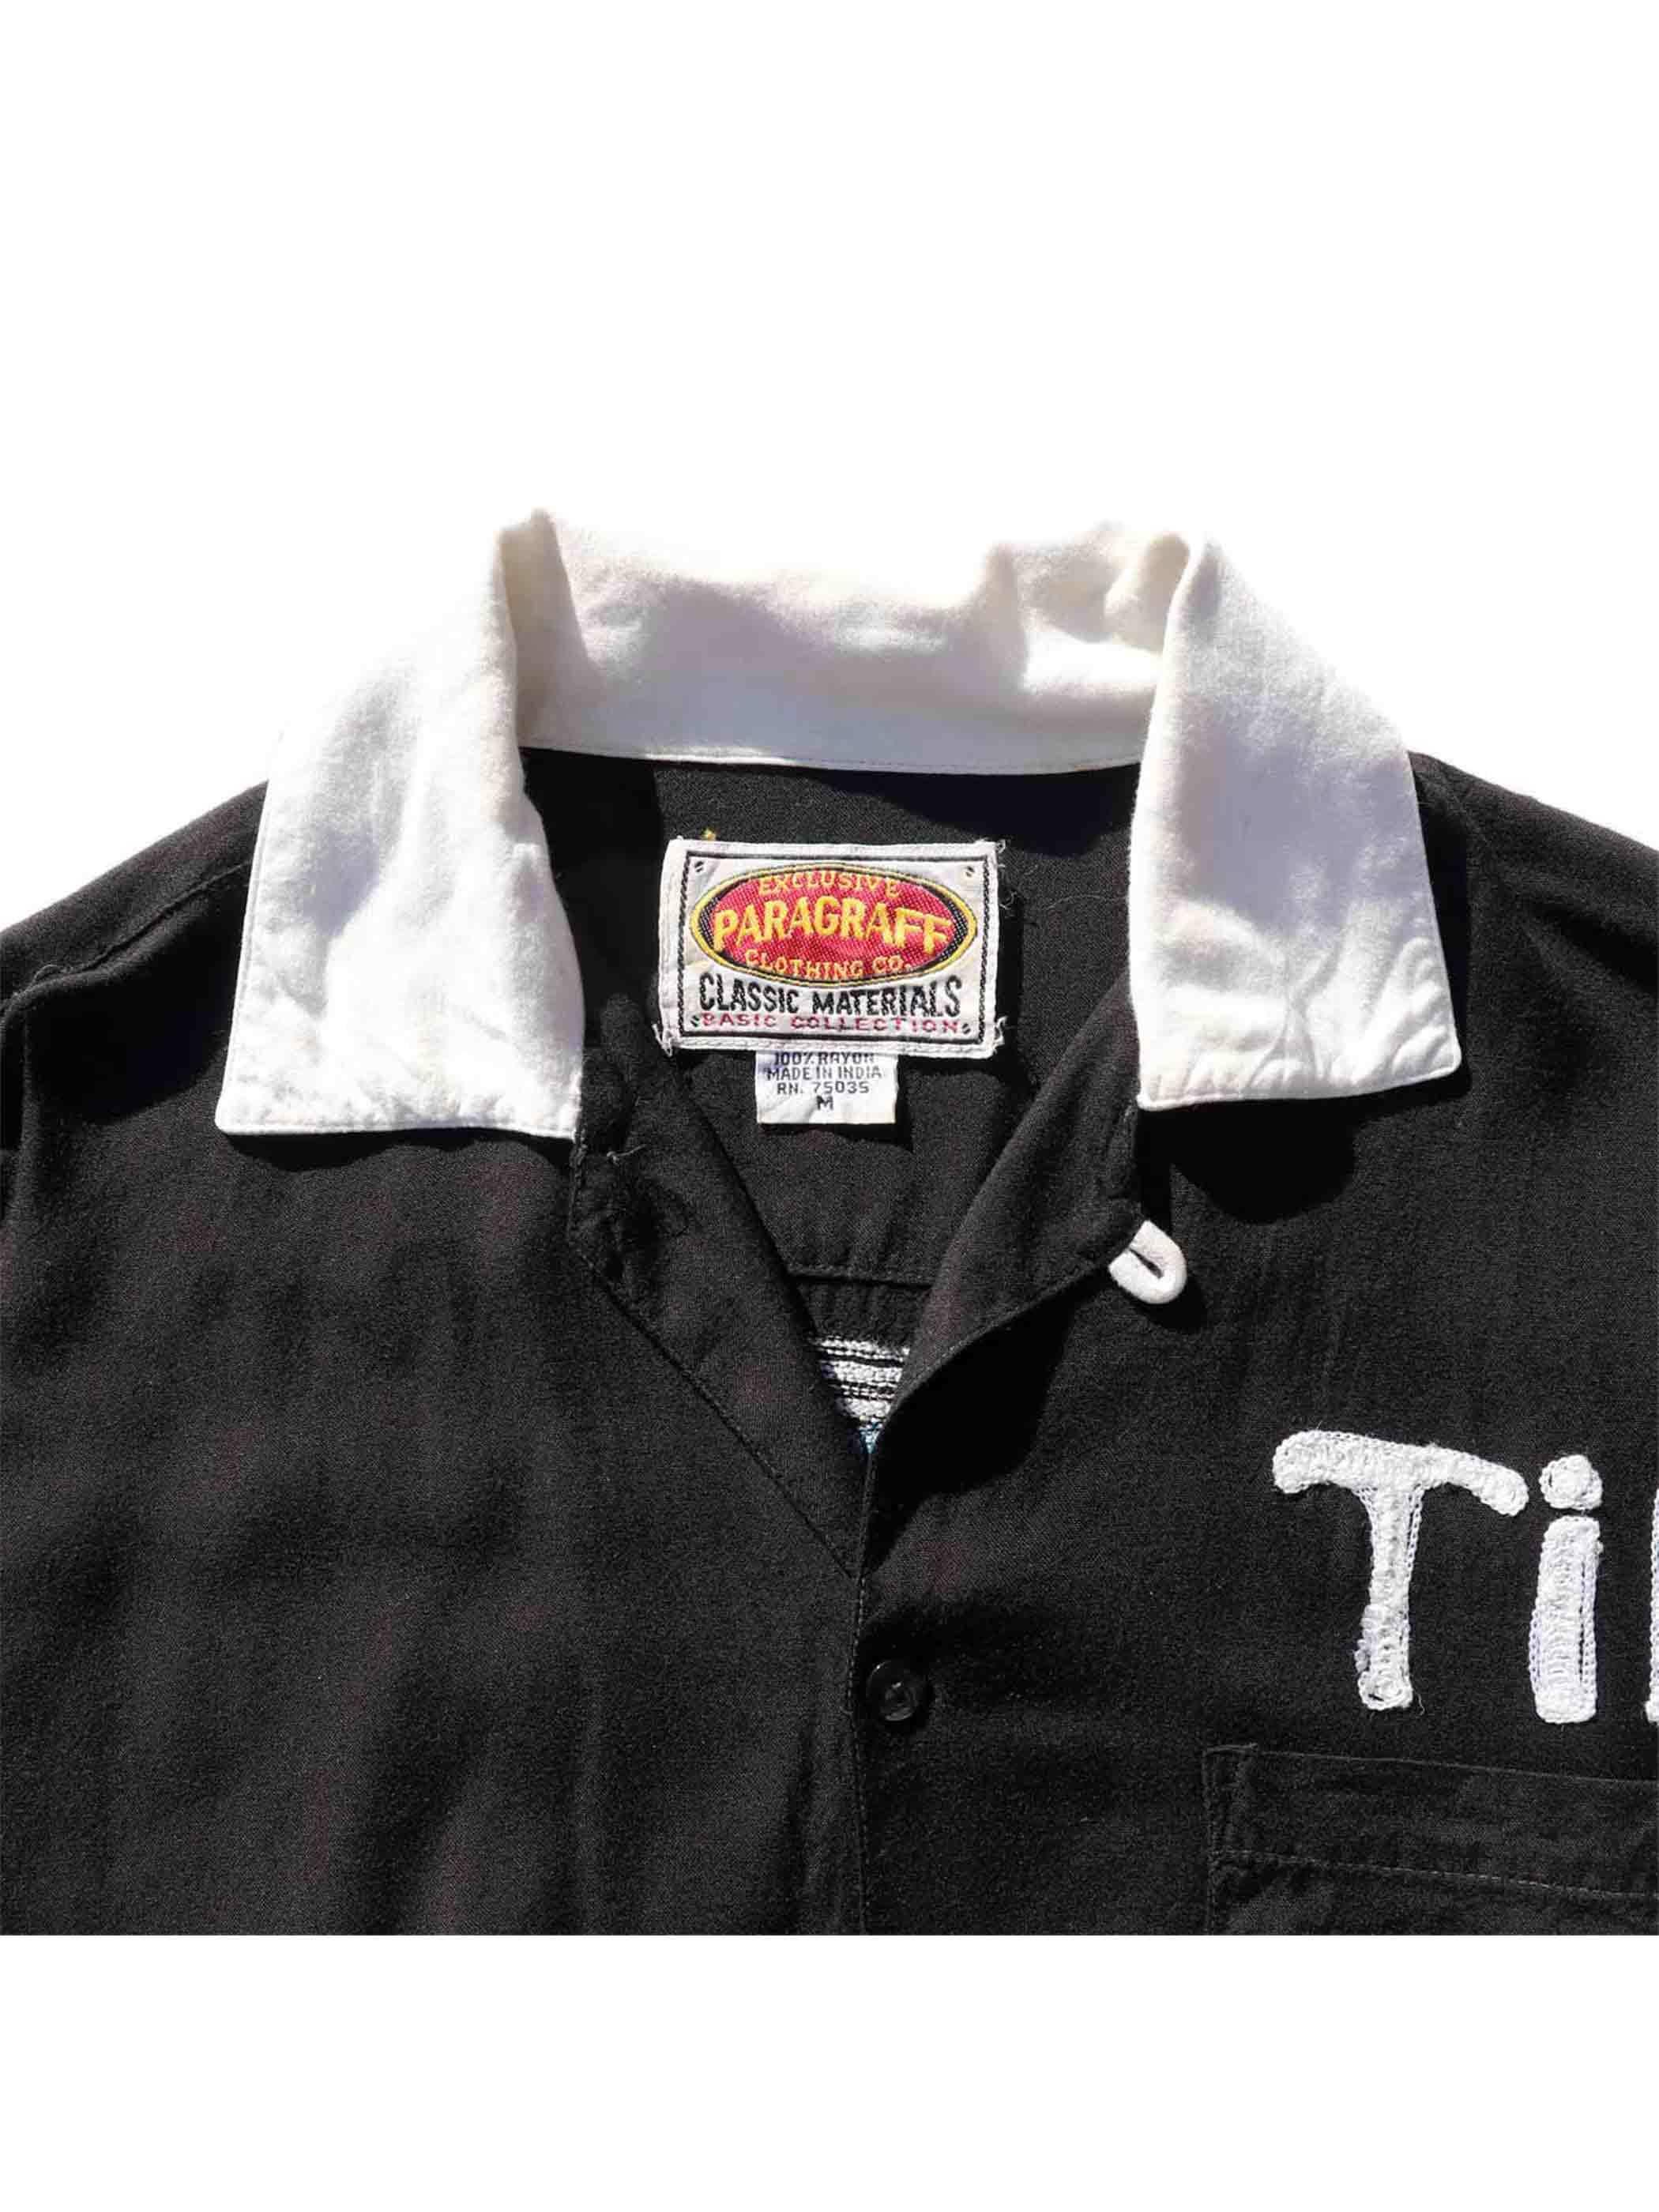 "90's PARAGRAFF ""MADUROS FUNERAL HOME"" Black Bowling Shirt [M]"